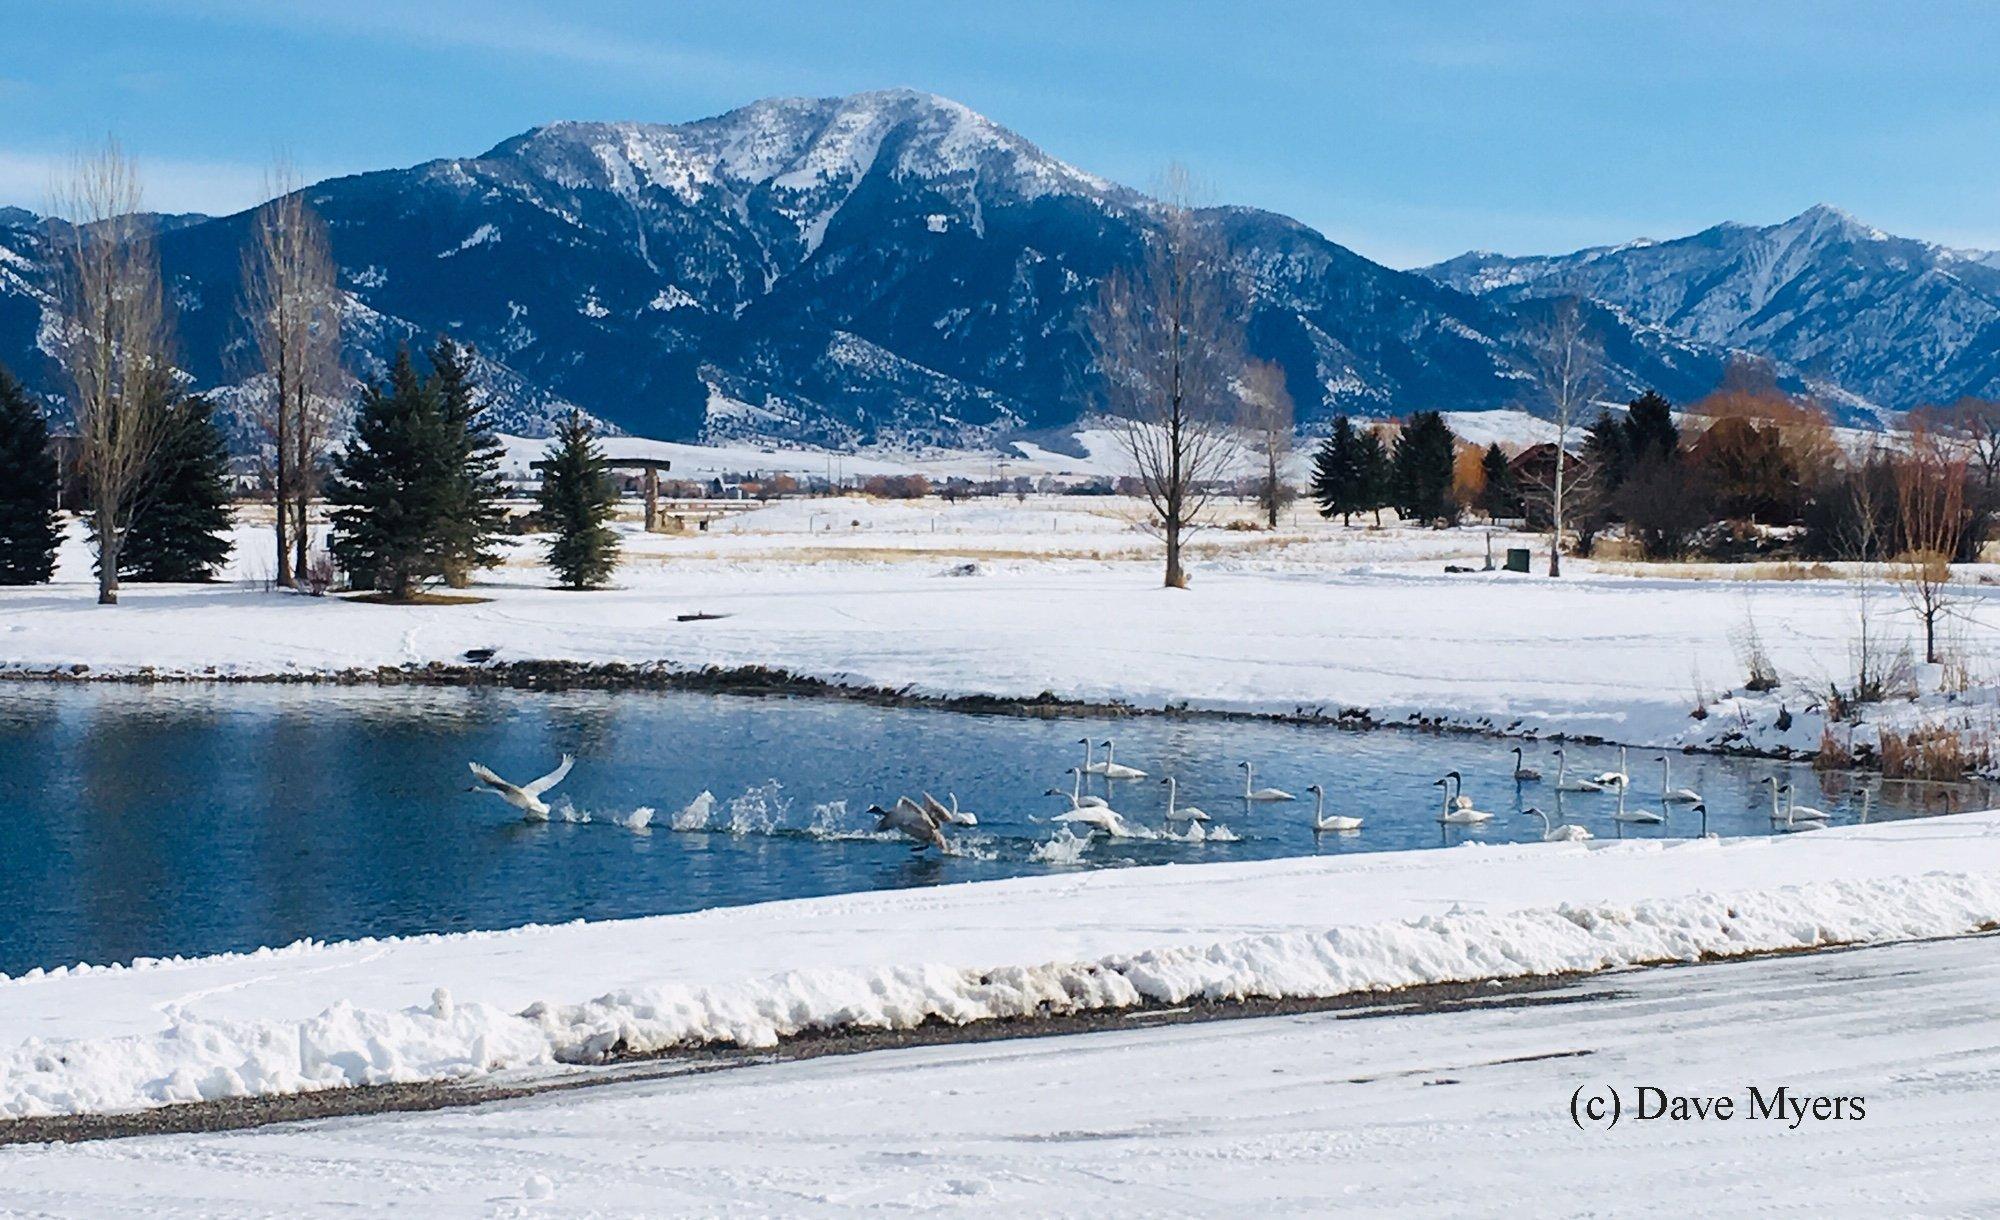 Swans in Swan Valley, Idaho